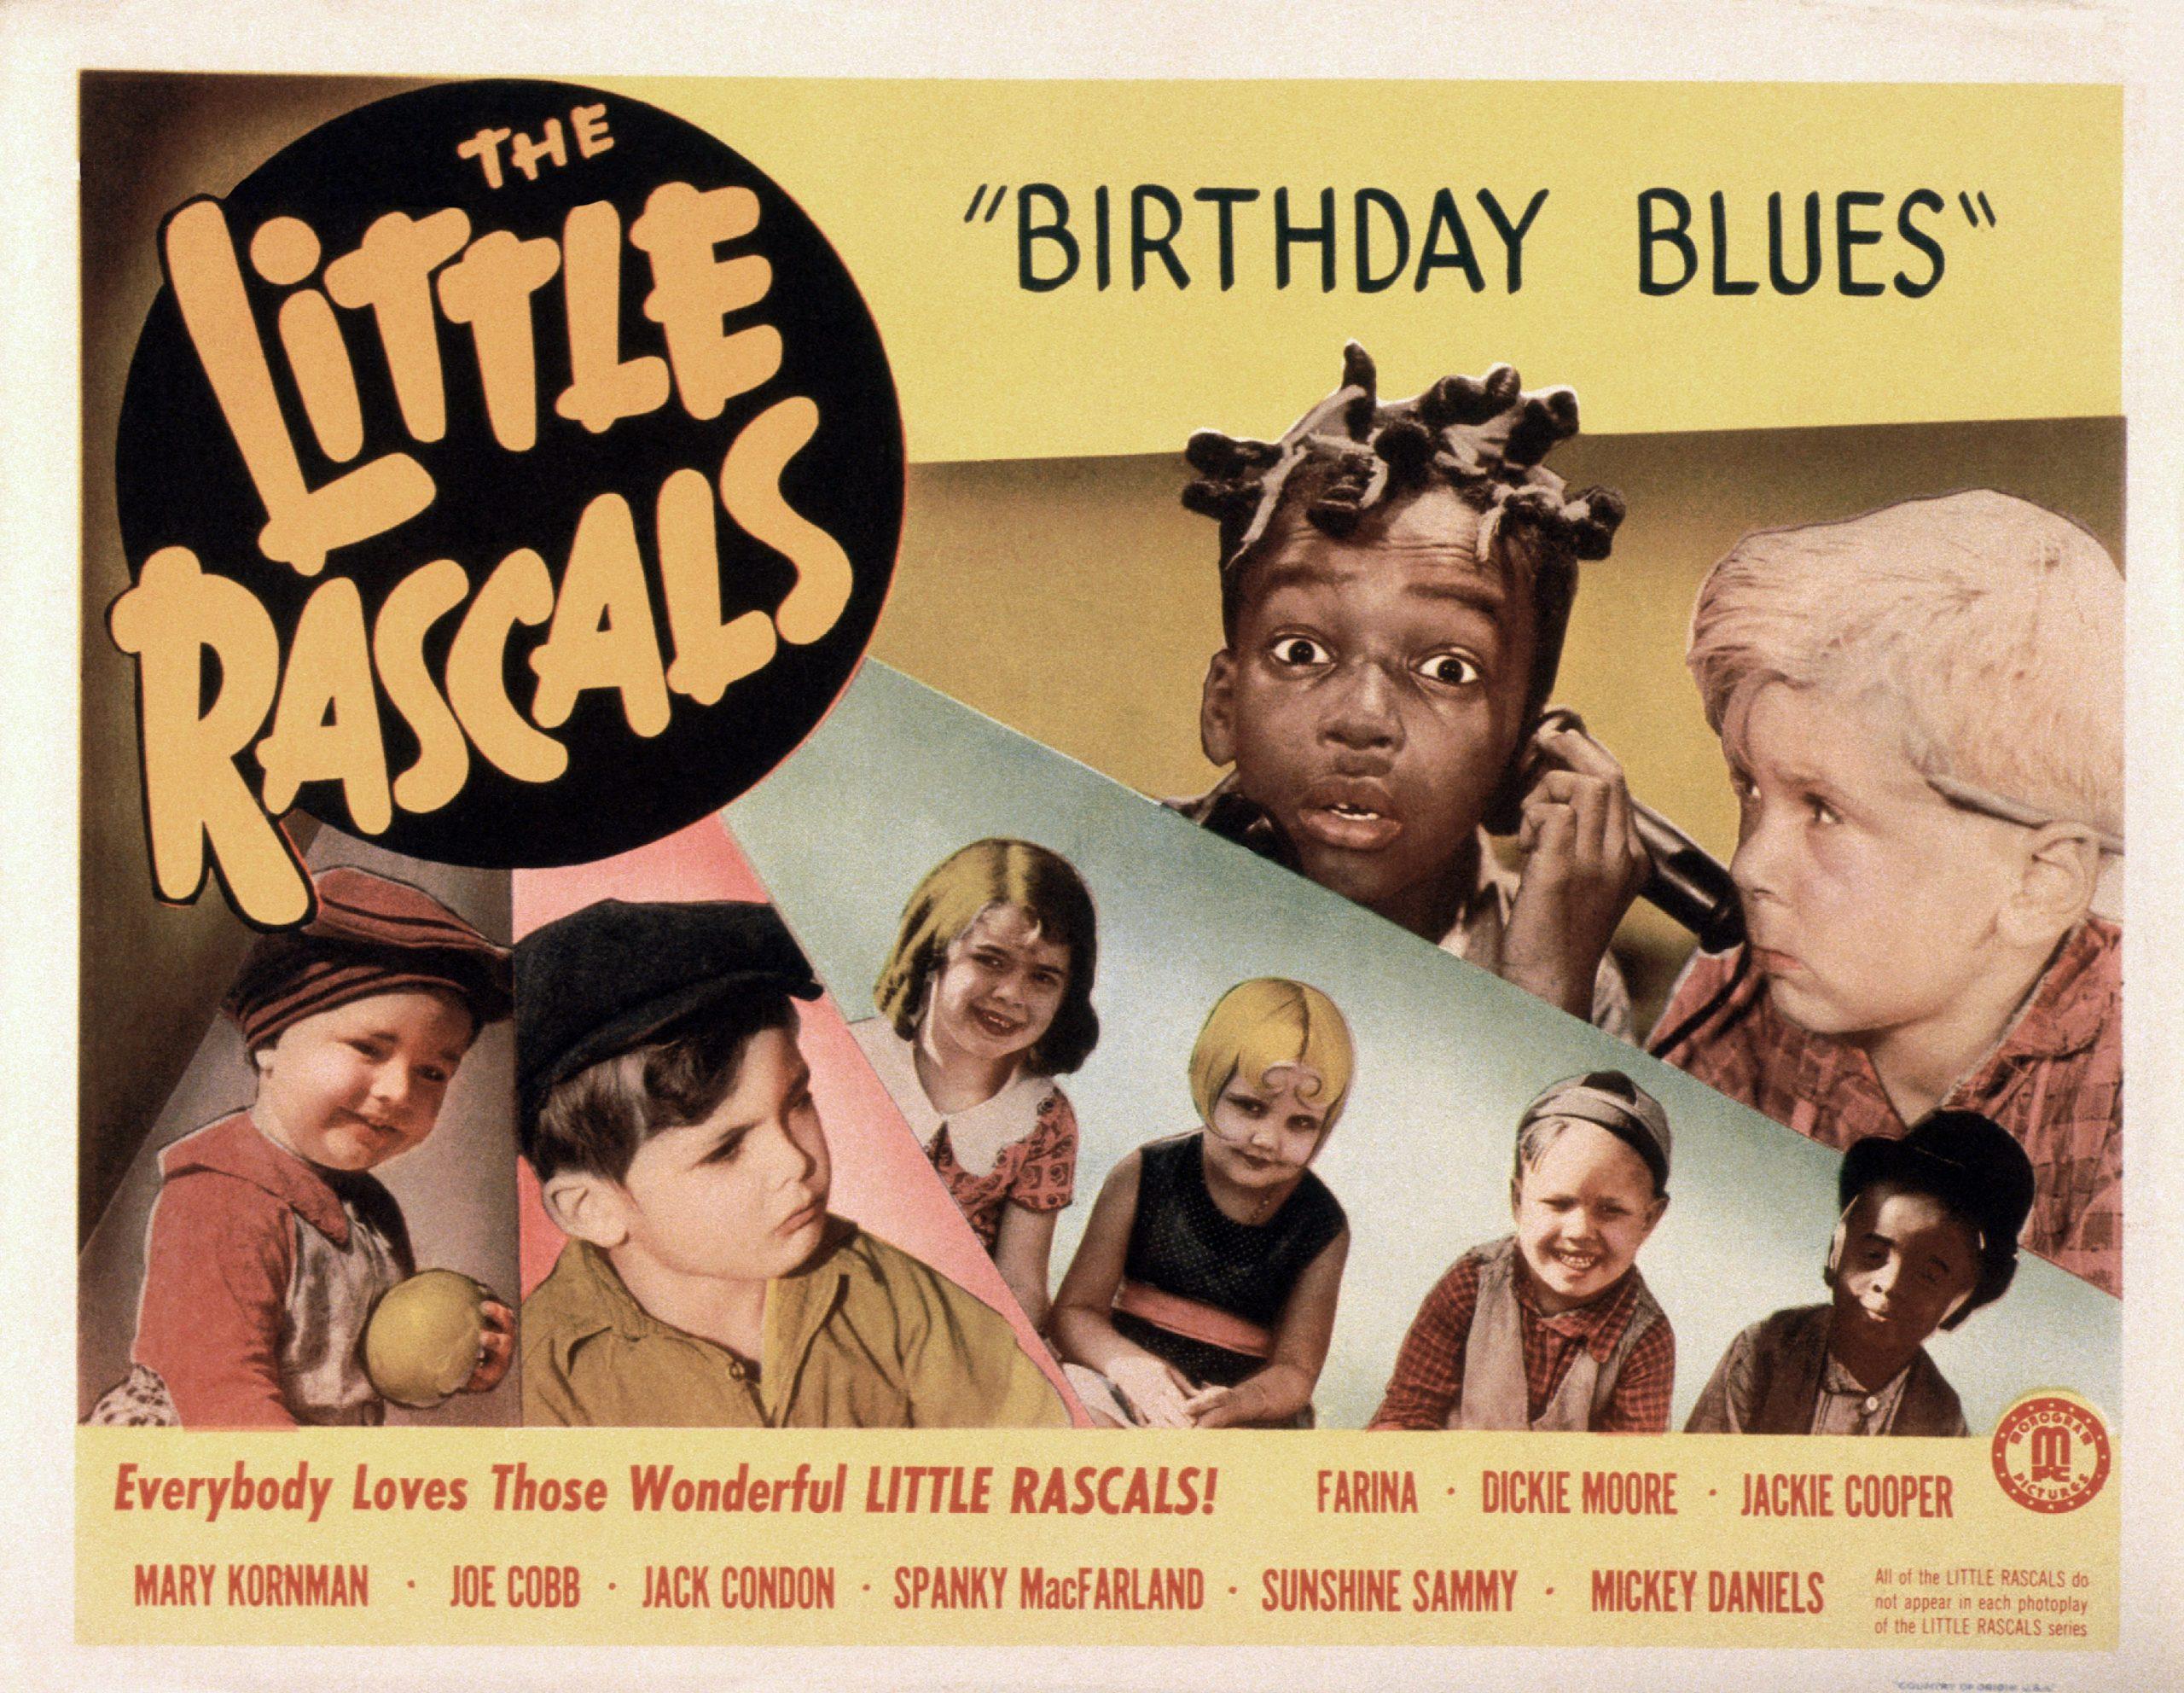 farina-little-rascals